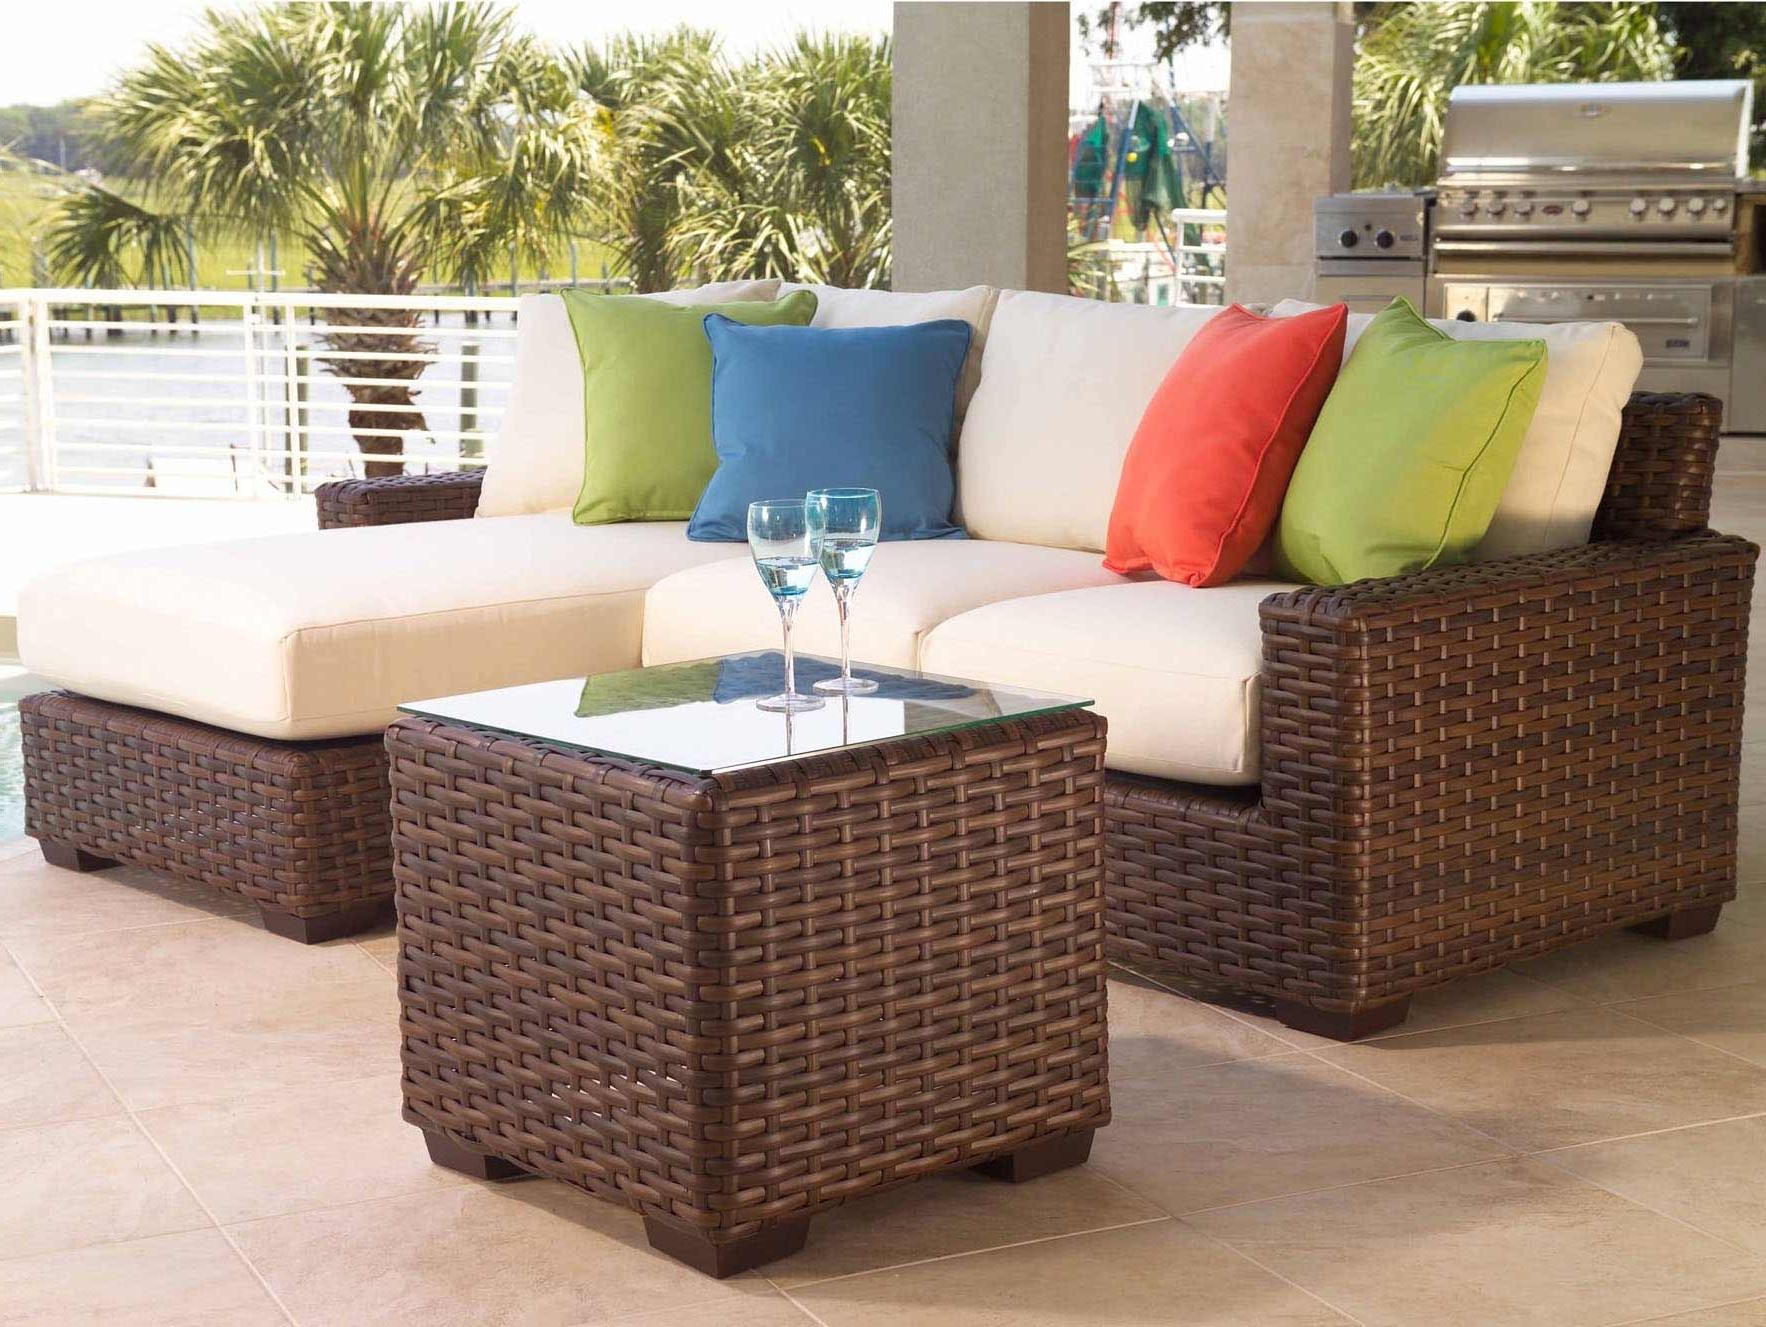 Sciclean Home Design : Restore (View 11 of 20)